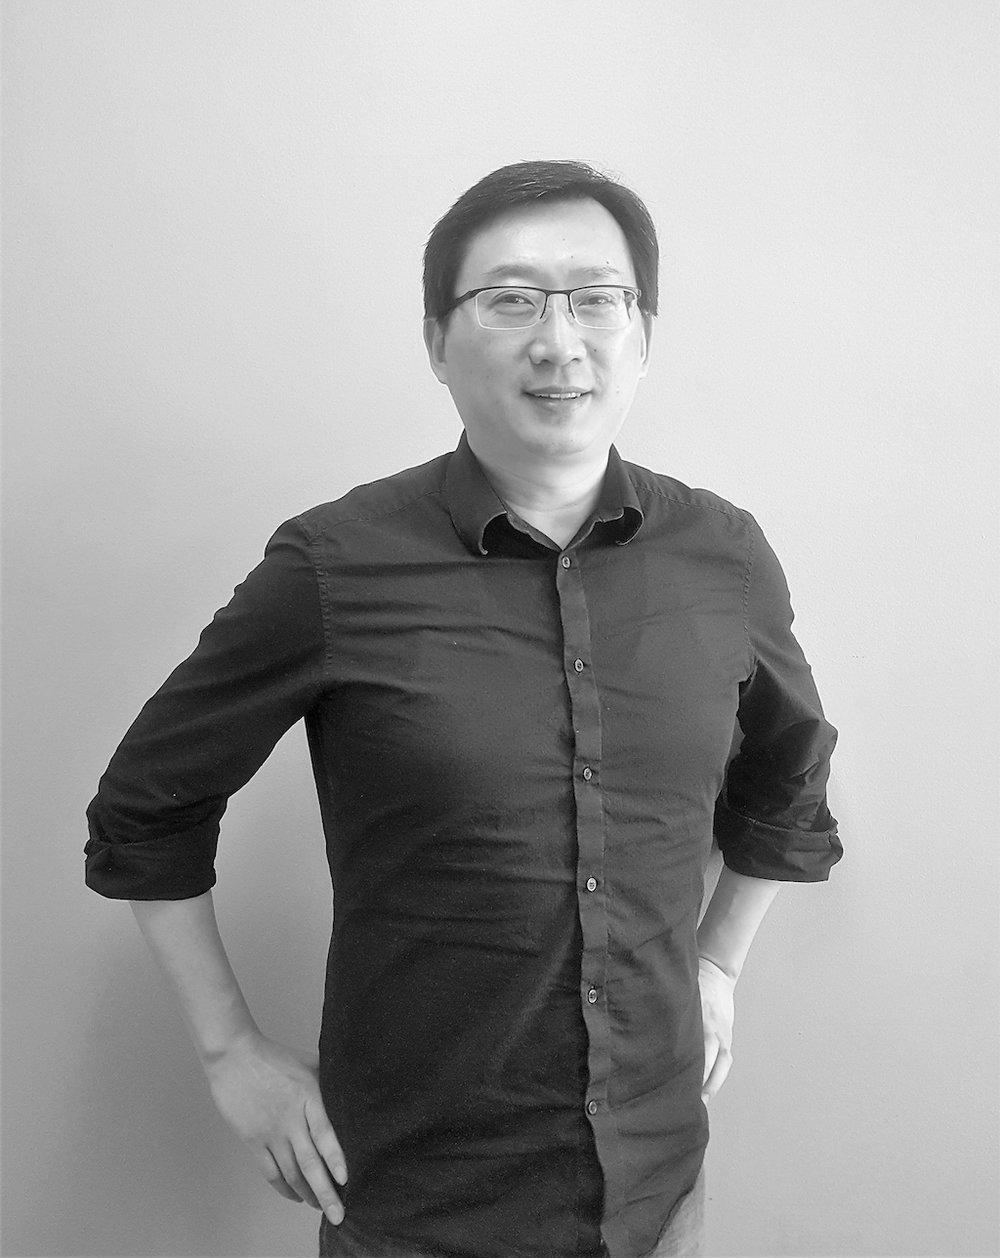 Tony Cui